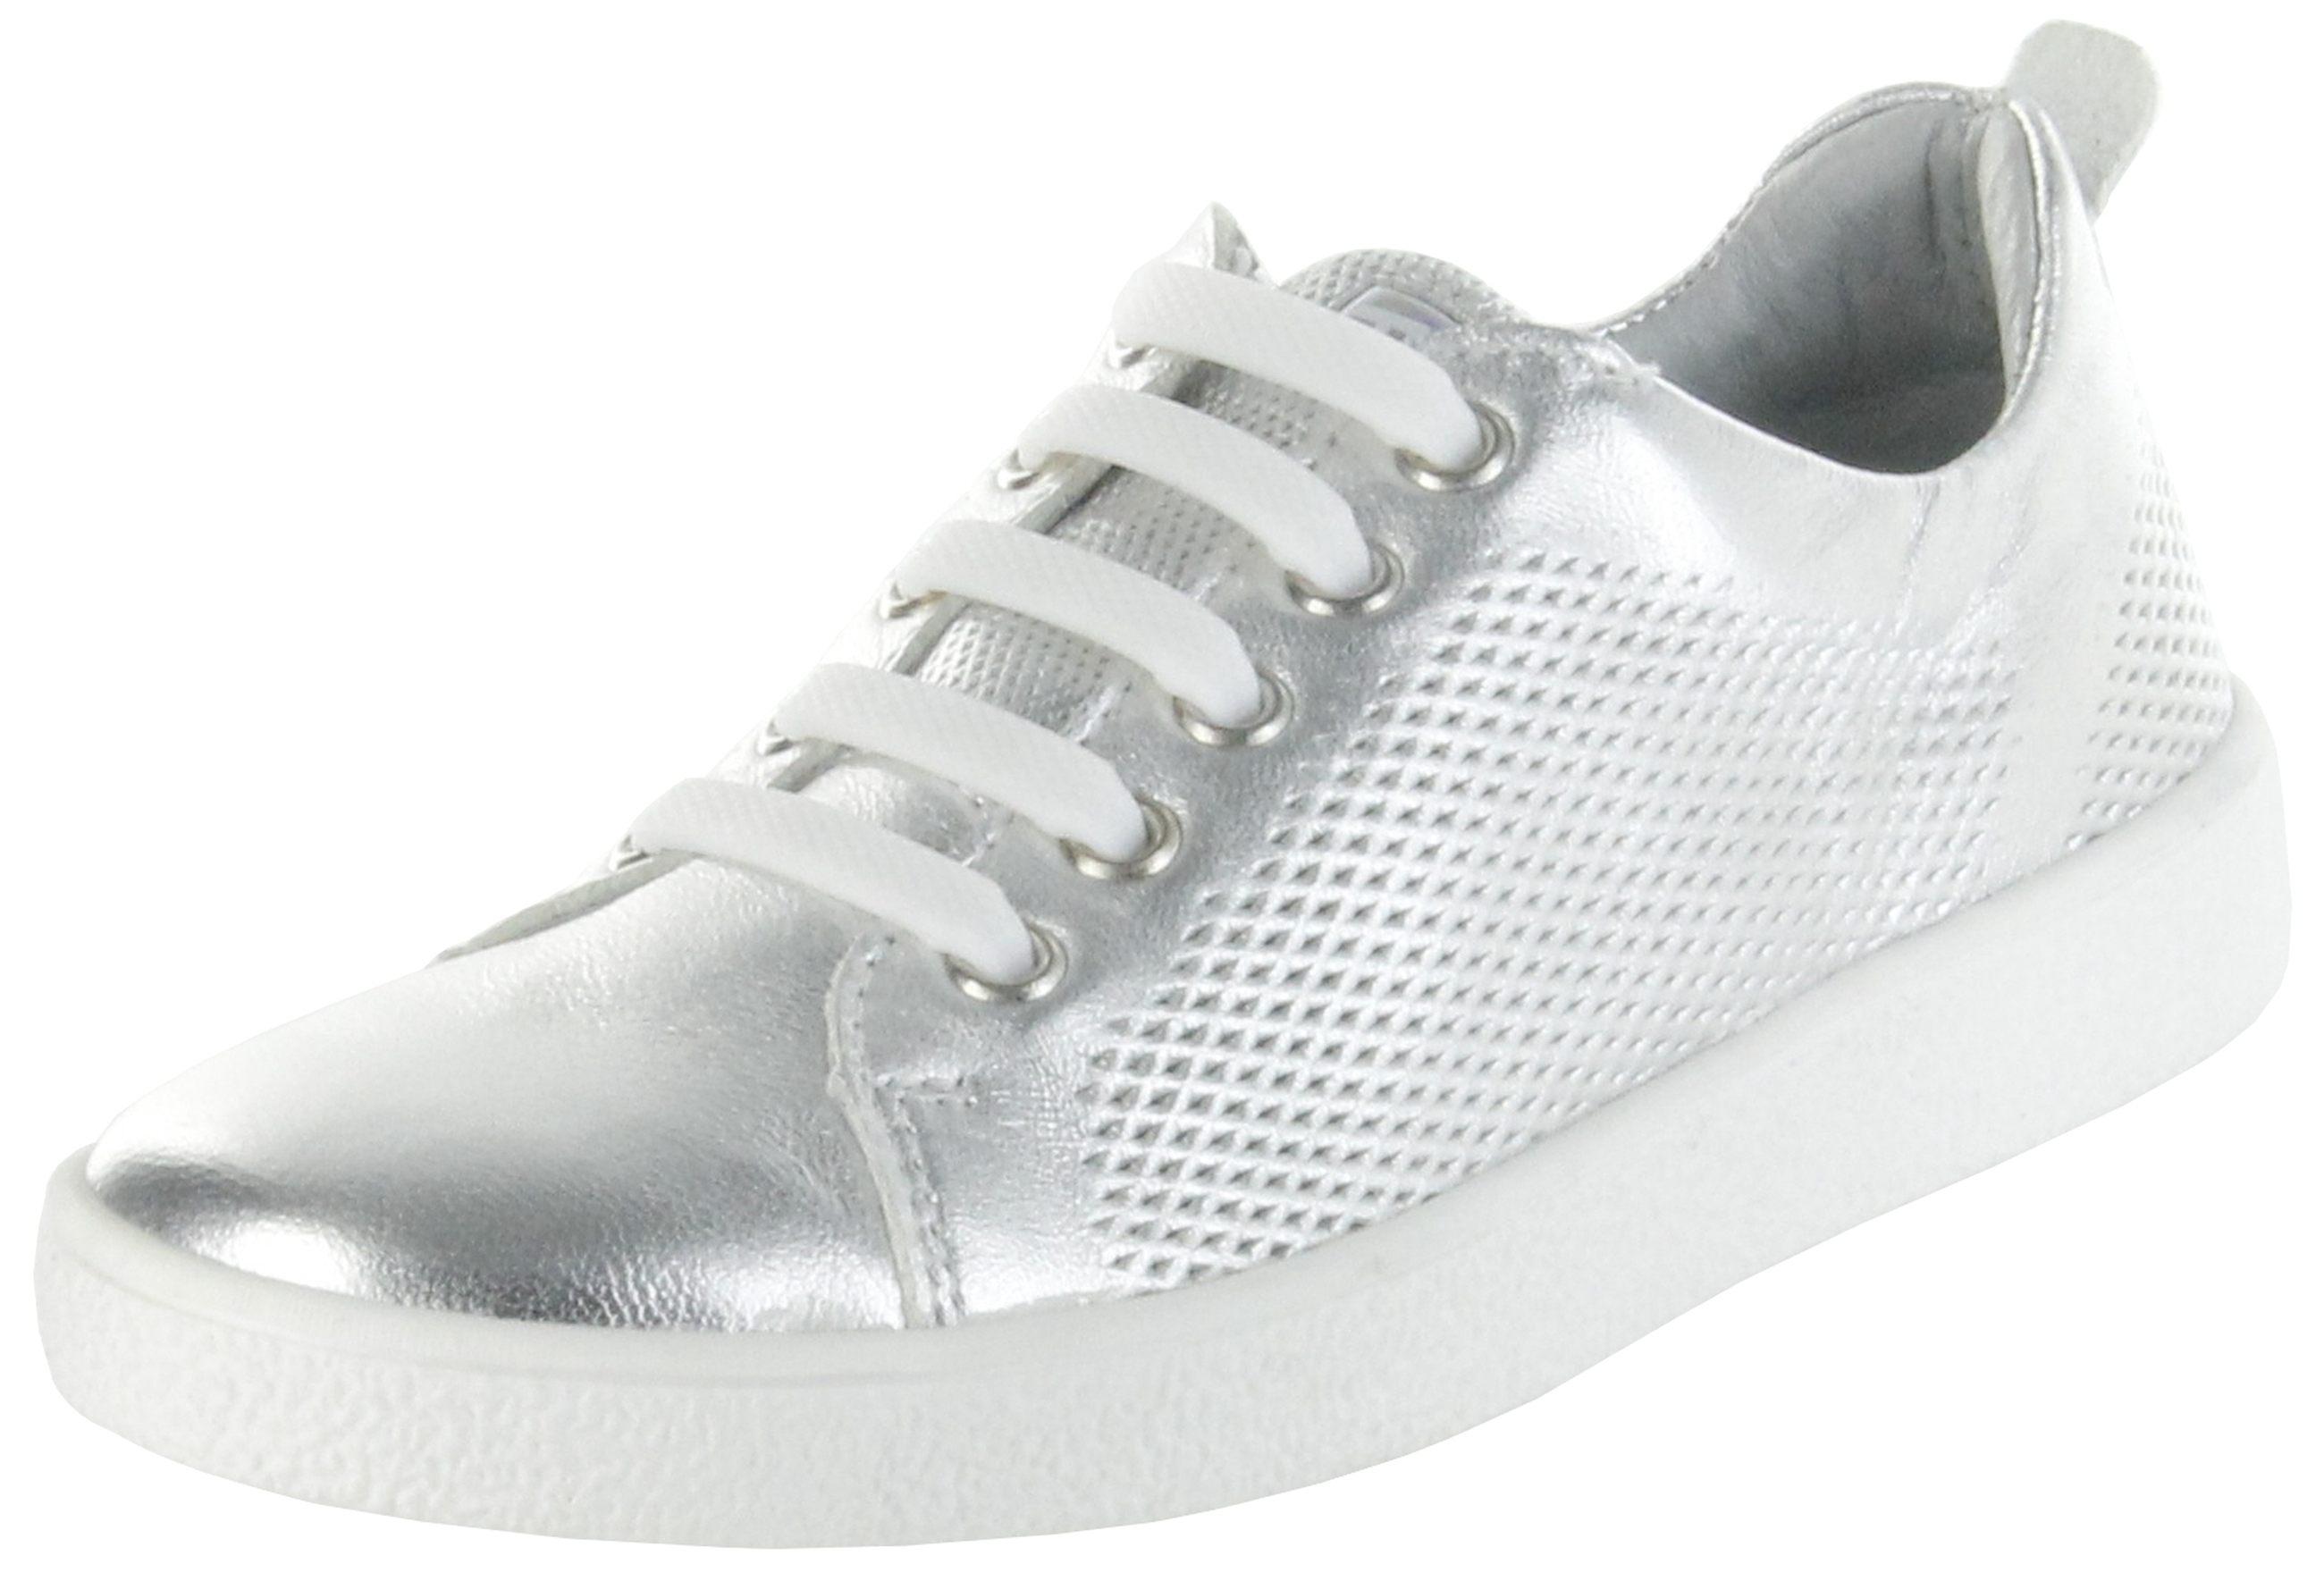 san francisco 9aef2 5ba6c Richter Kinder Halbschuhe Sneaker silber Metallicleder Mädchen Schuhe  3621-342-0200 Rimmel